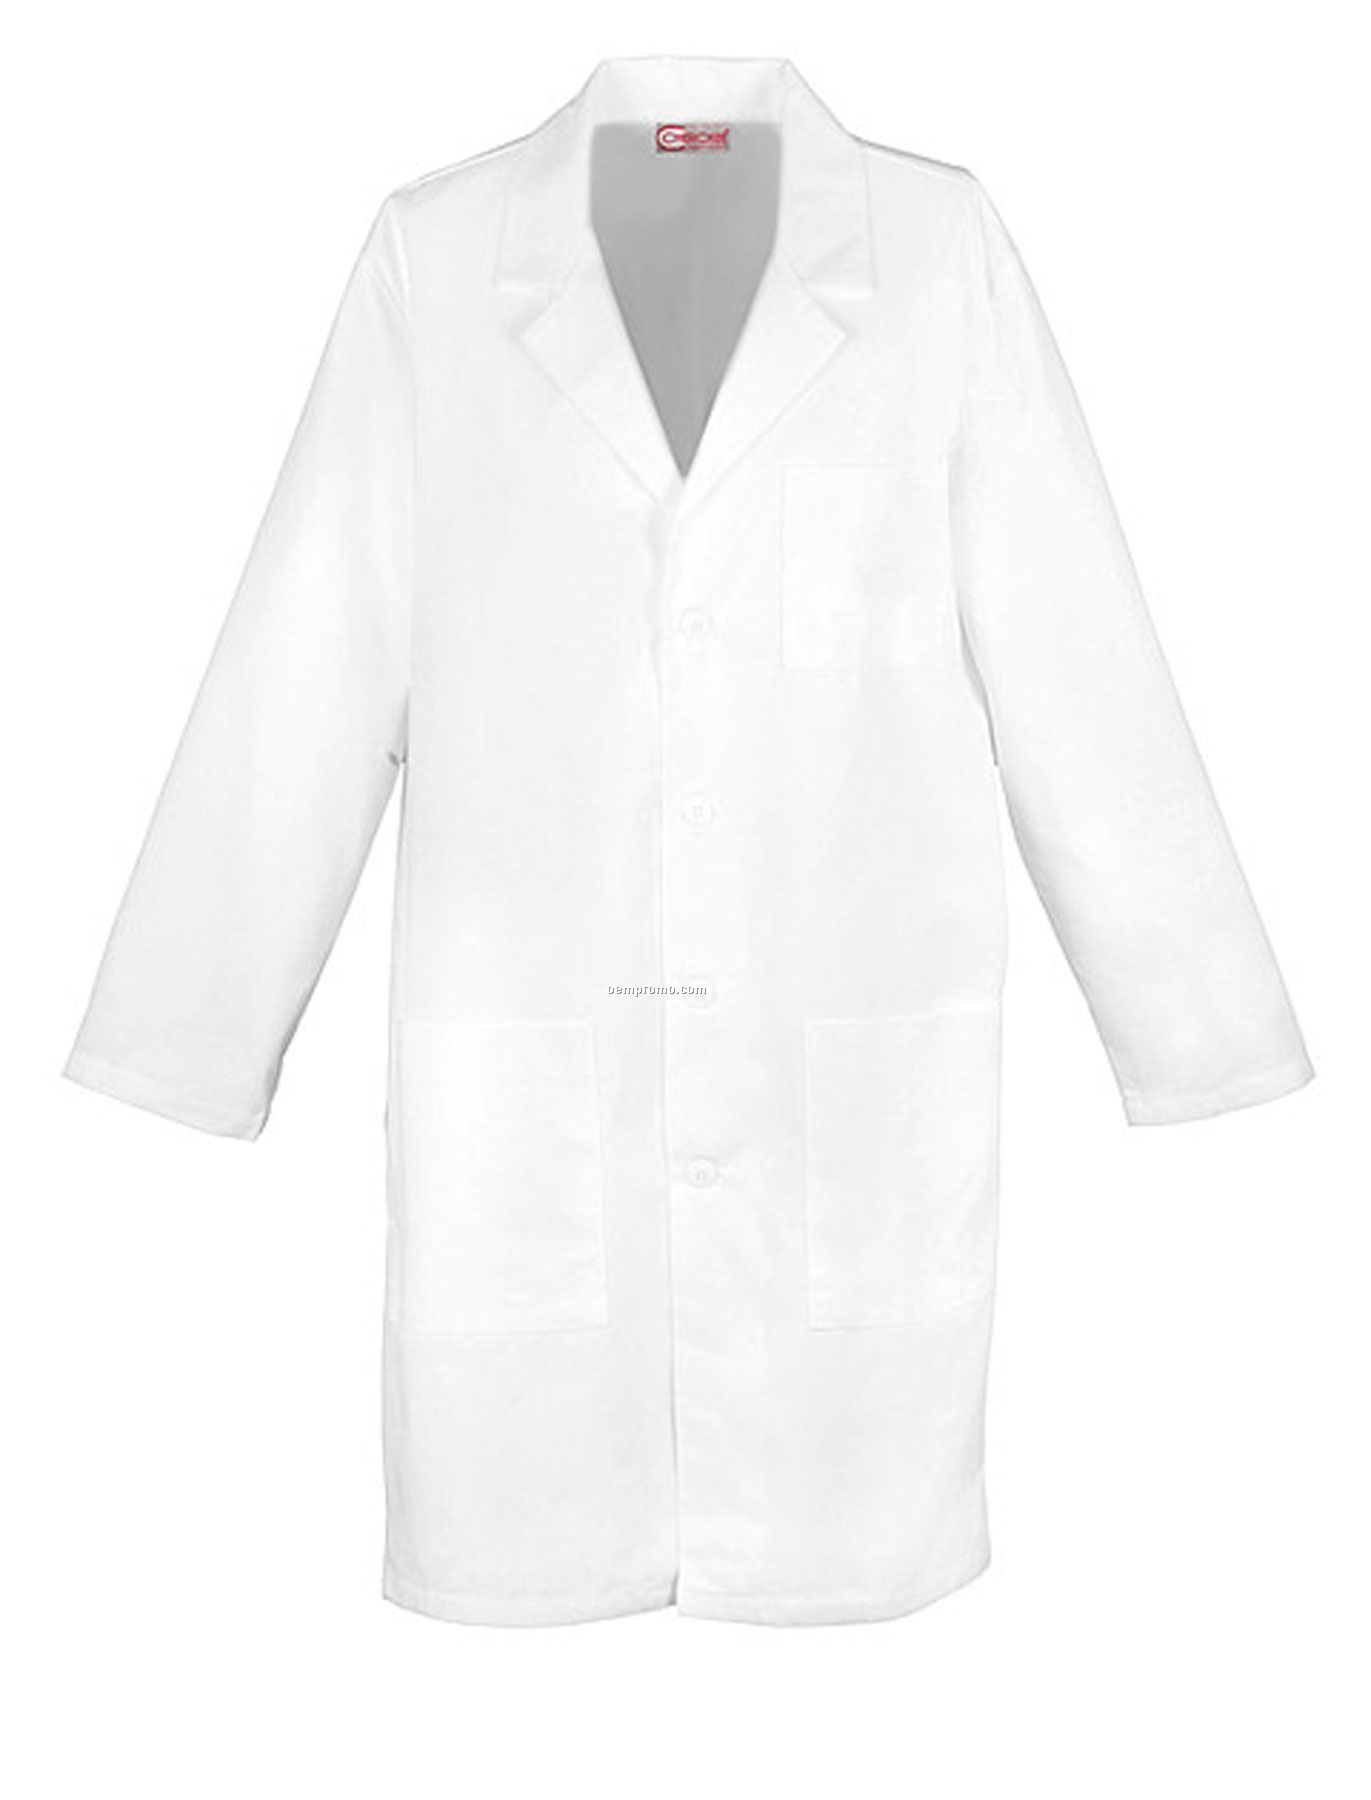 "Cherokee 40"" Lab Coat"